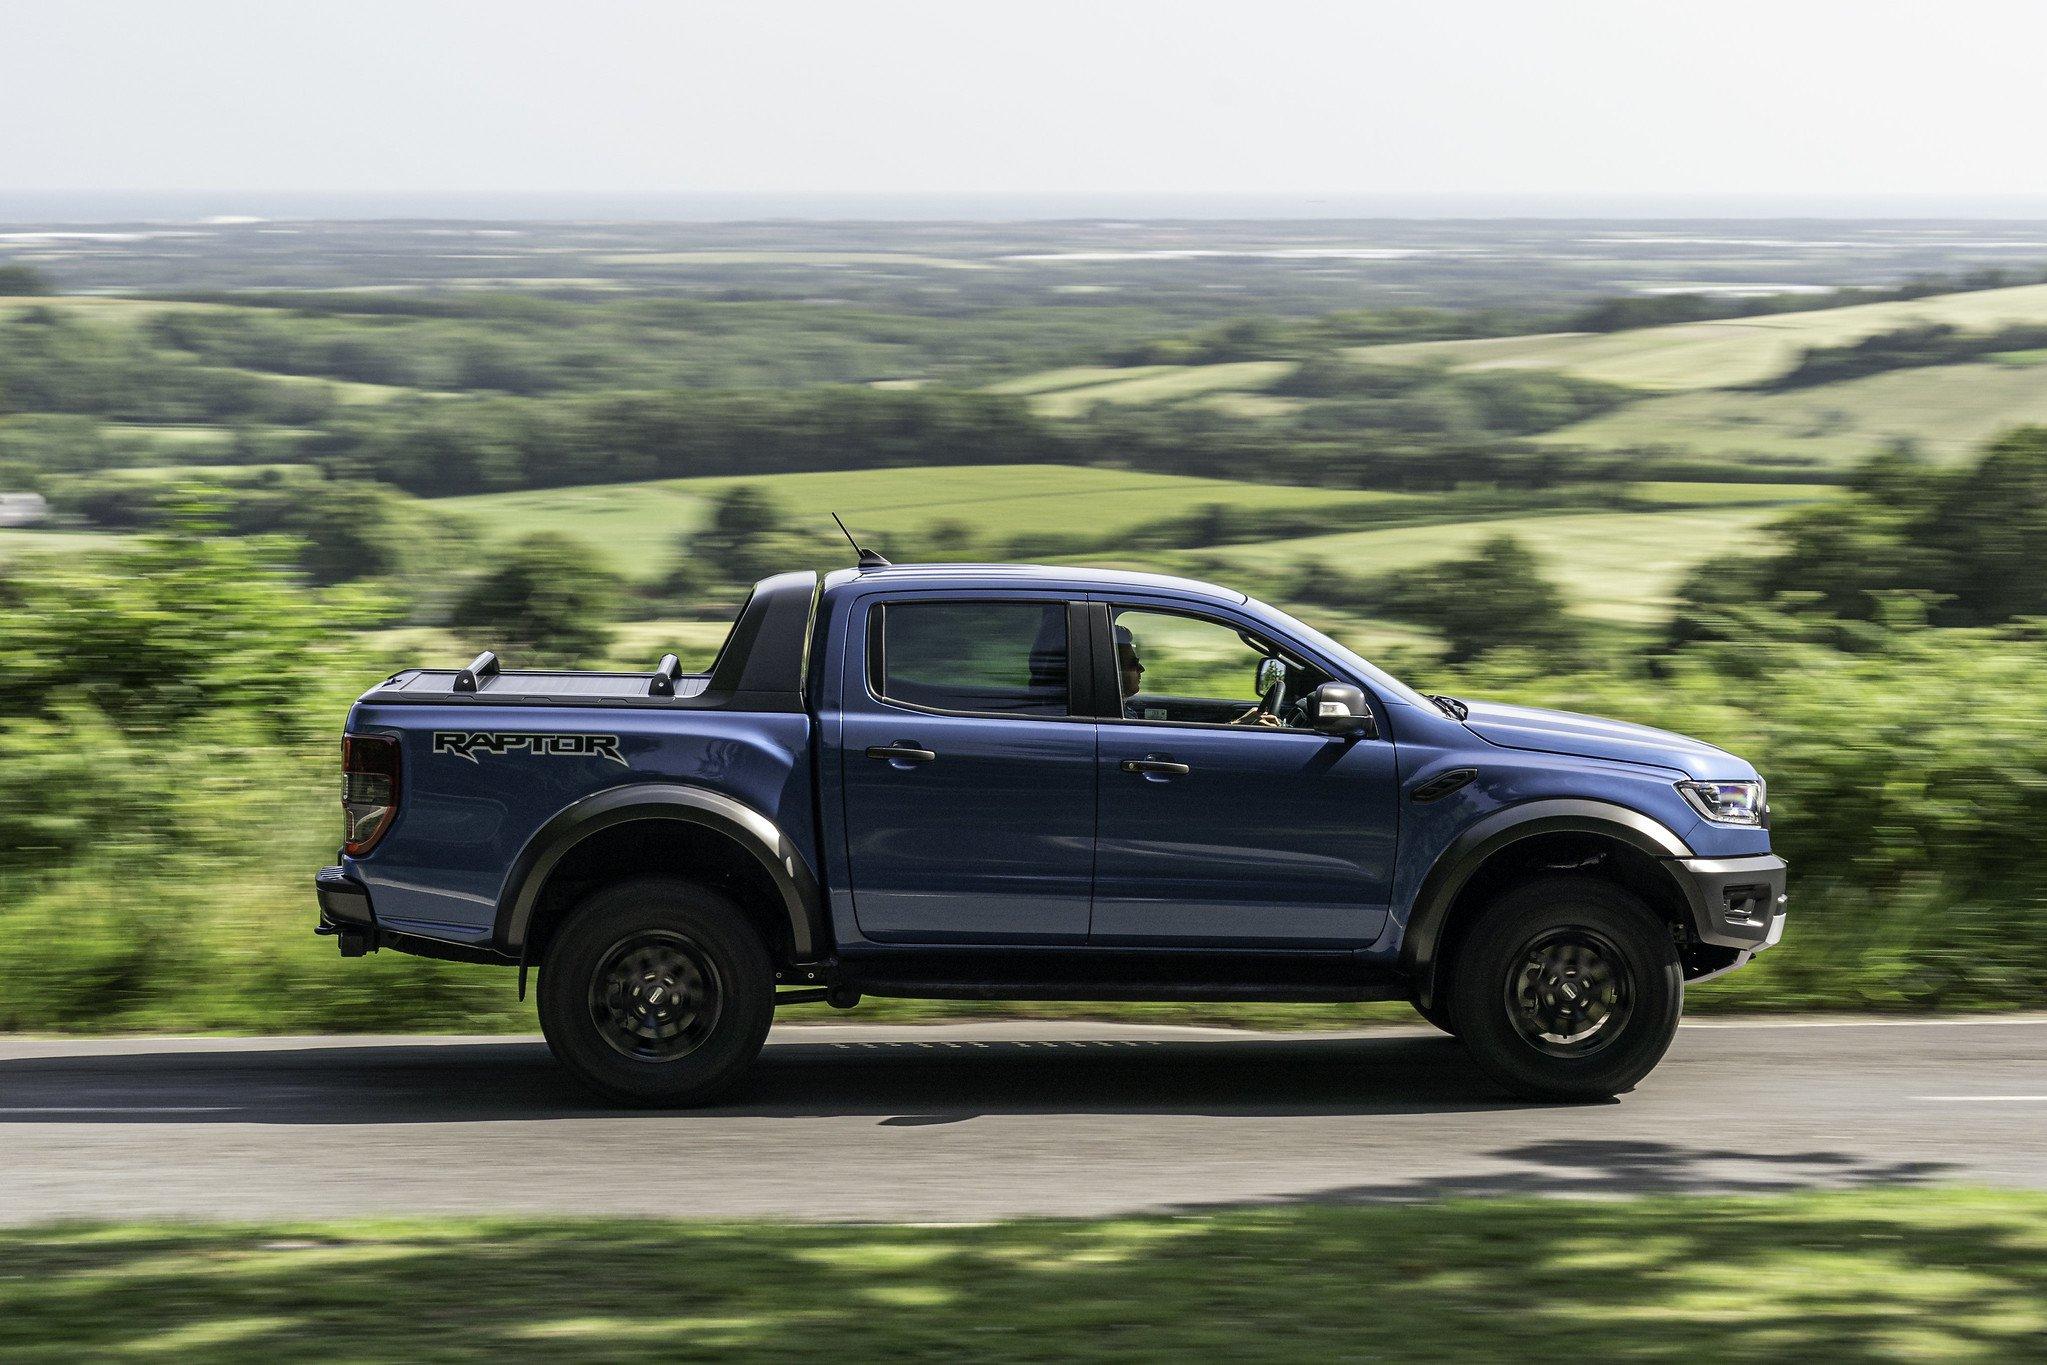 2019 Ford Ranger Raptor side